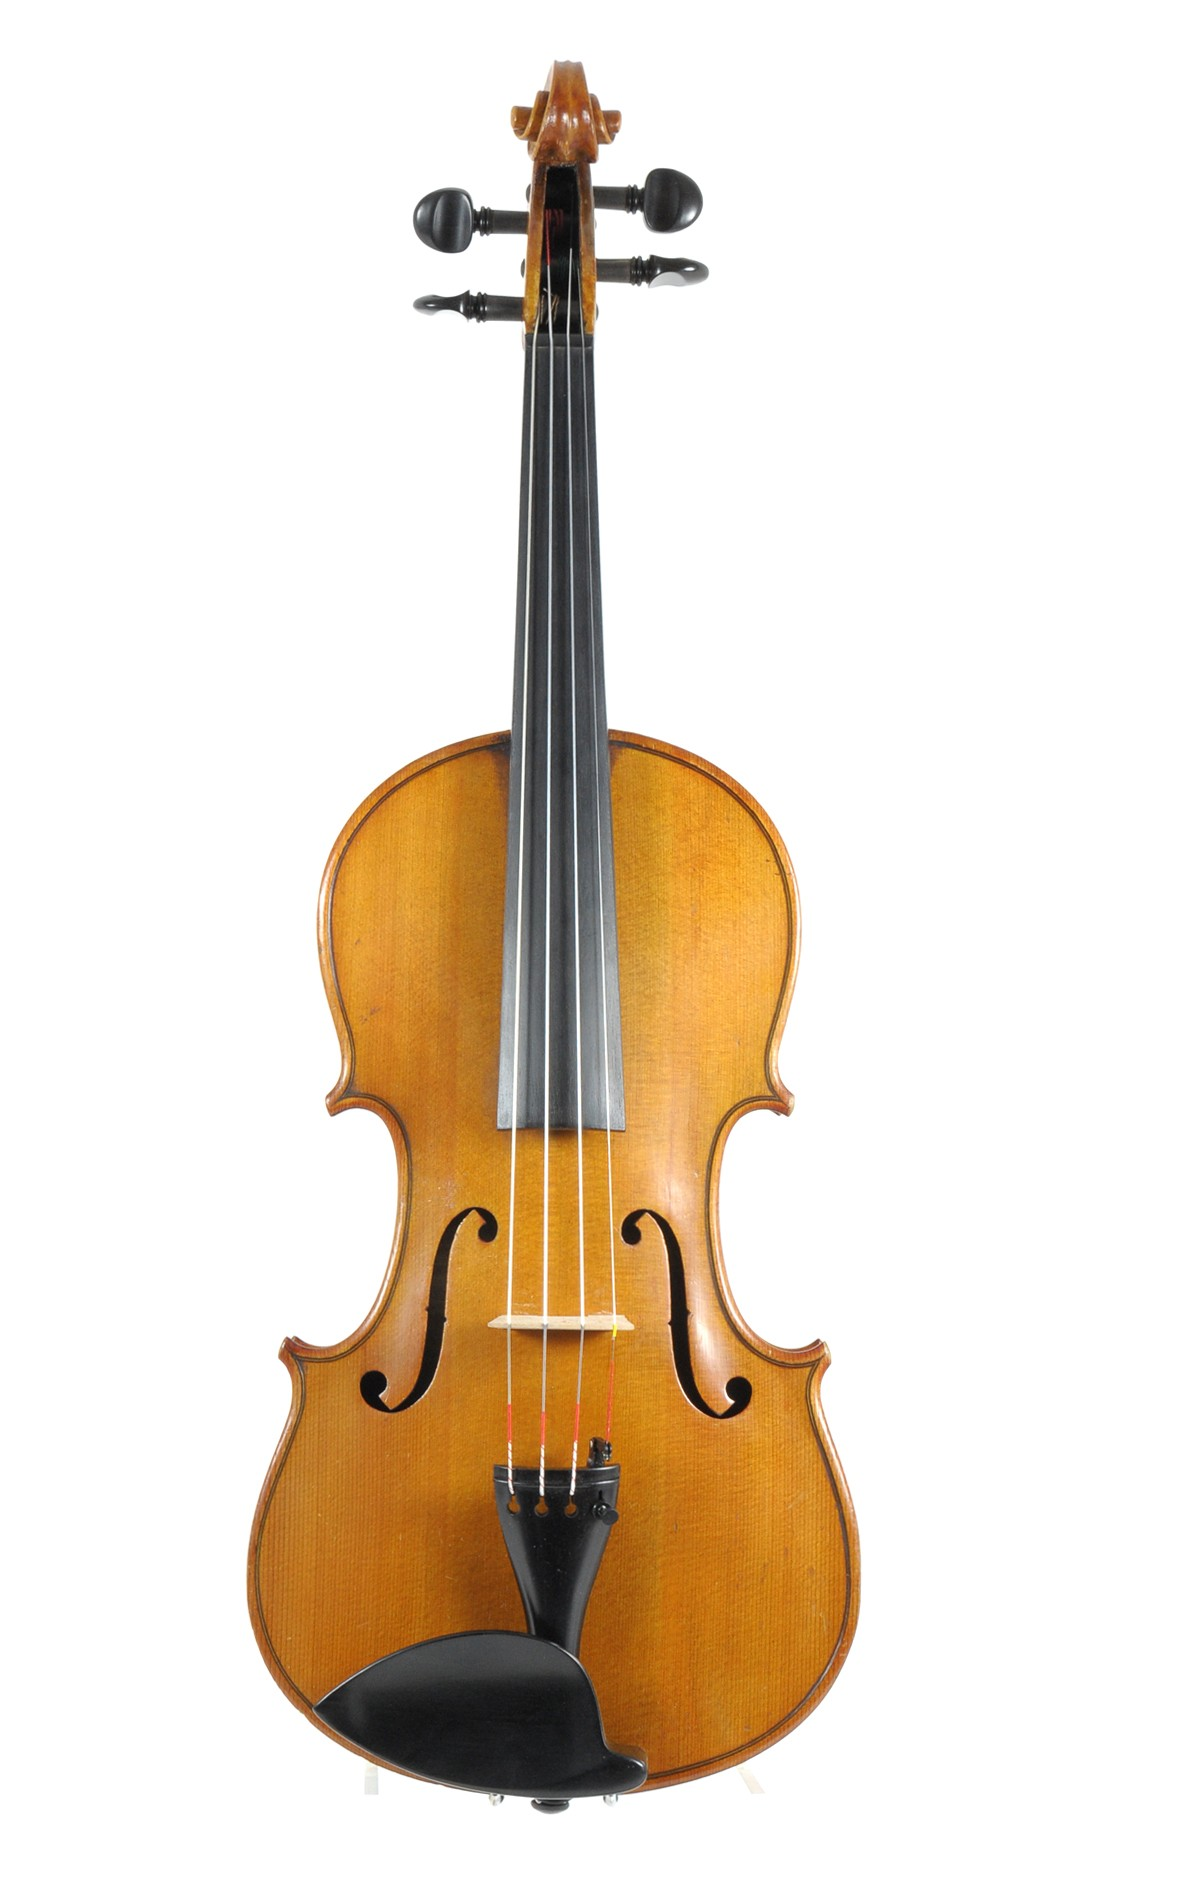 Violin, Saxony, around 1900